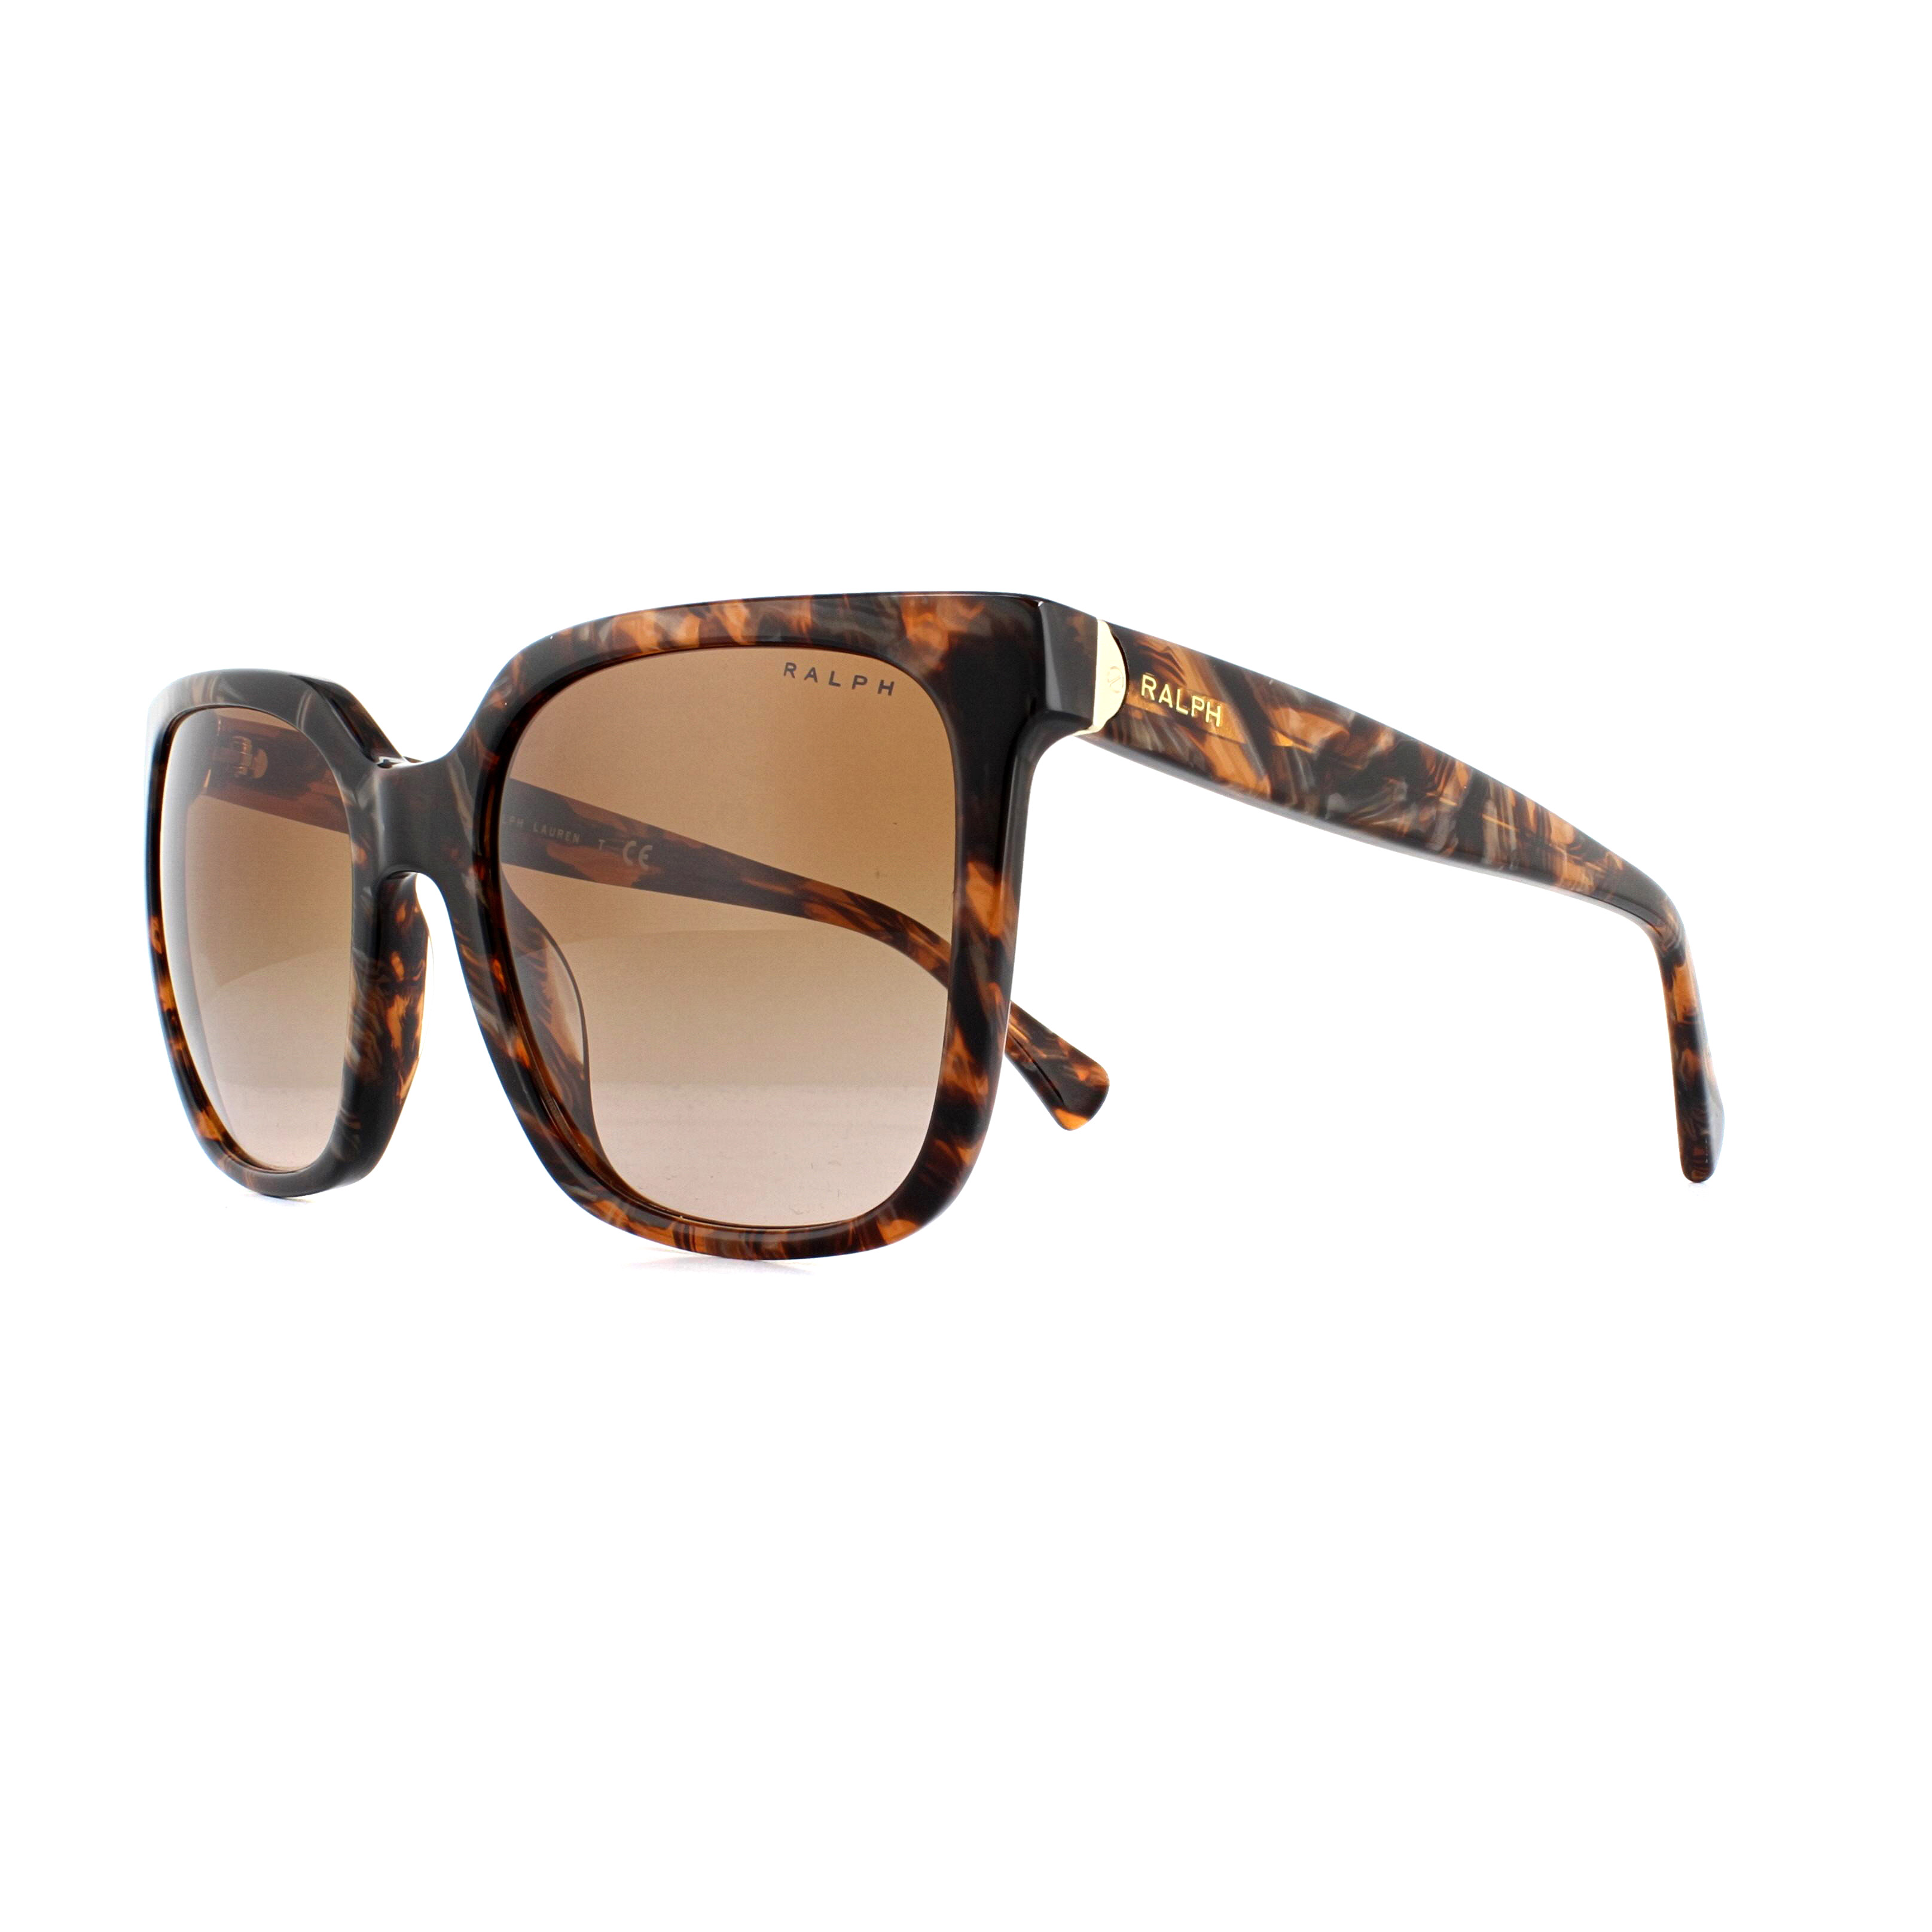 c1569e183b8e Details about Ralph by Ralph Lauren Sunglasses RA5251 573813 Tortoise Brown  Orange Gradient